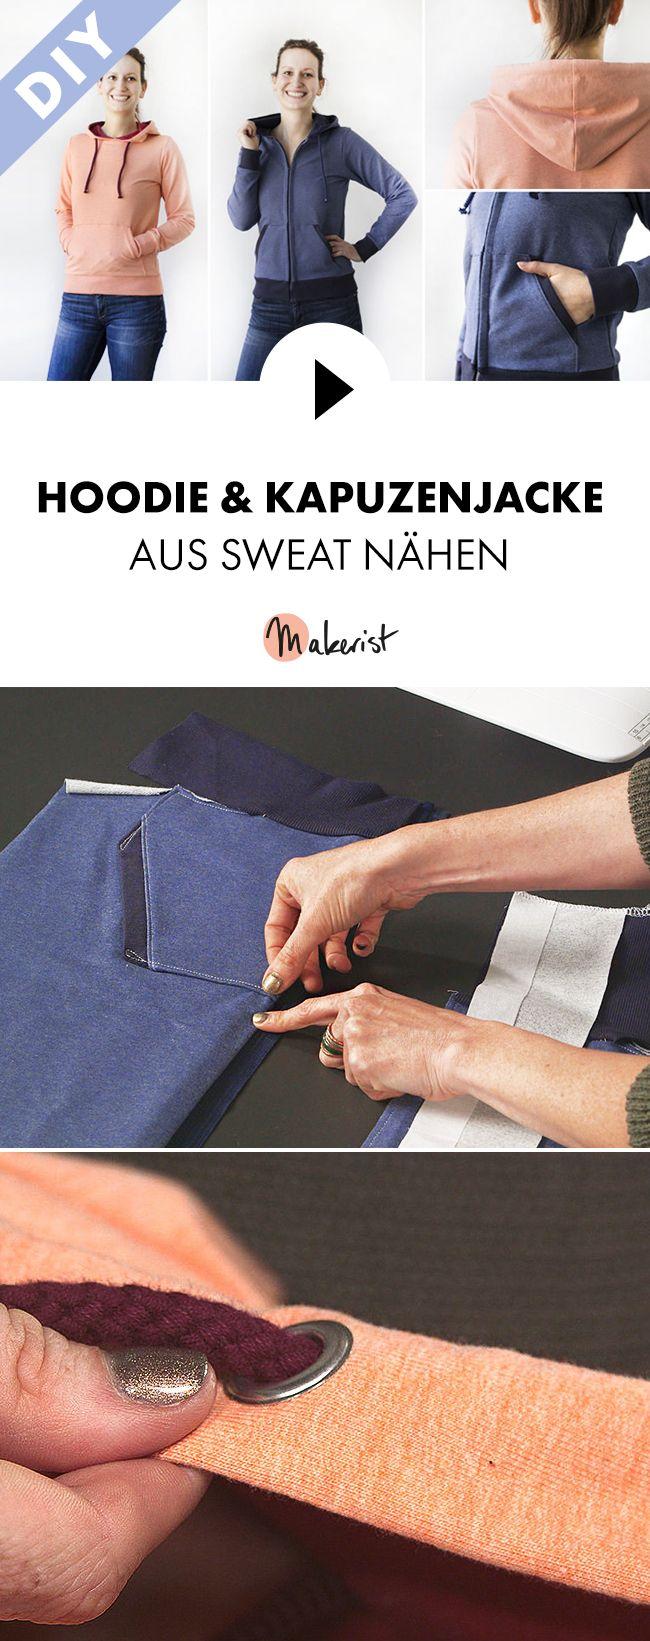 Hoodies nähen mit Sweatstoff - Schritt für Schritt erklärt im Video-Kurs via Makerist.de